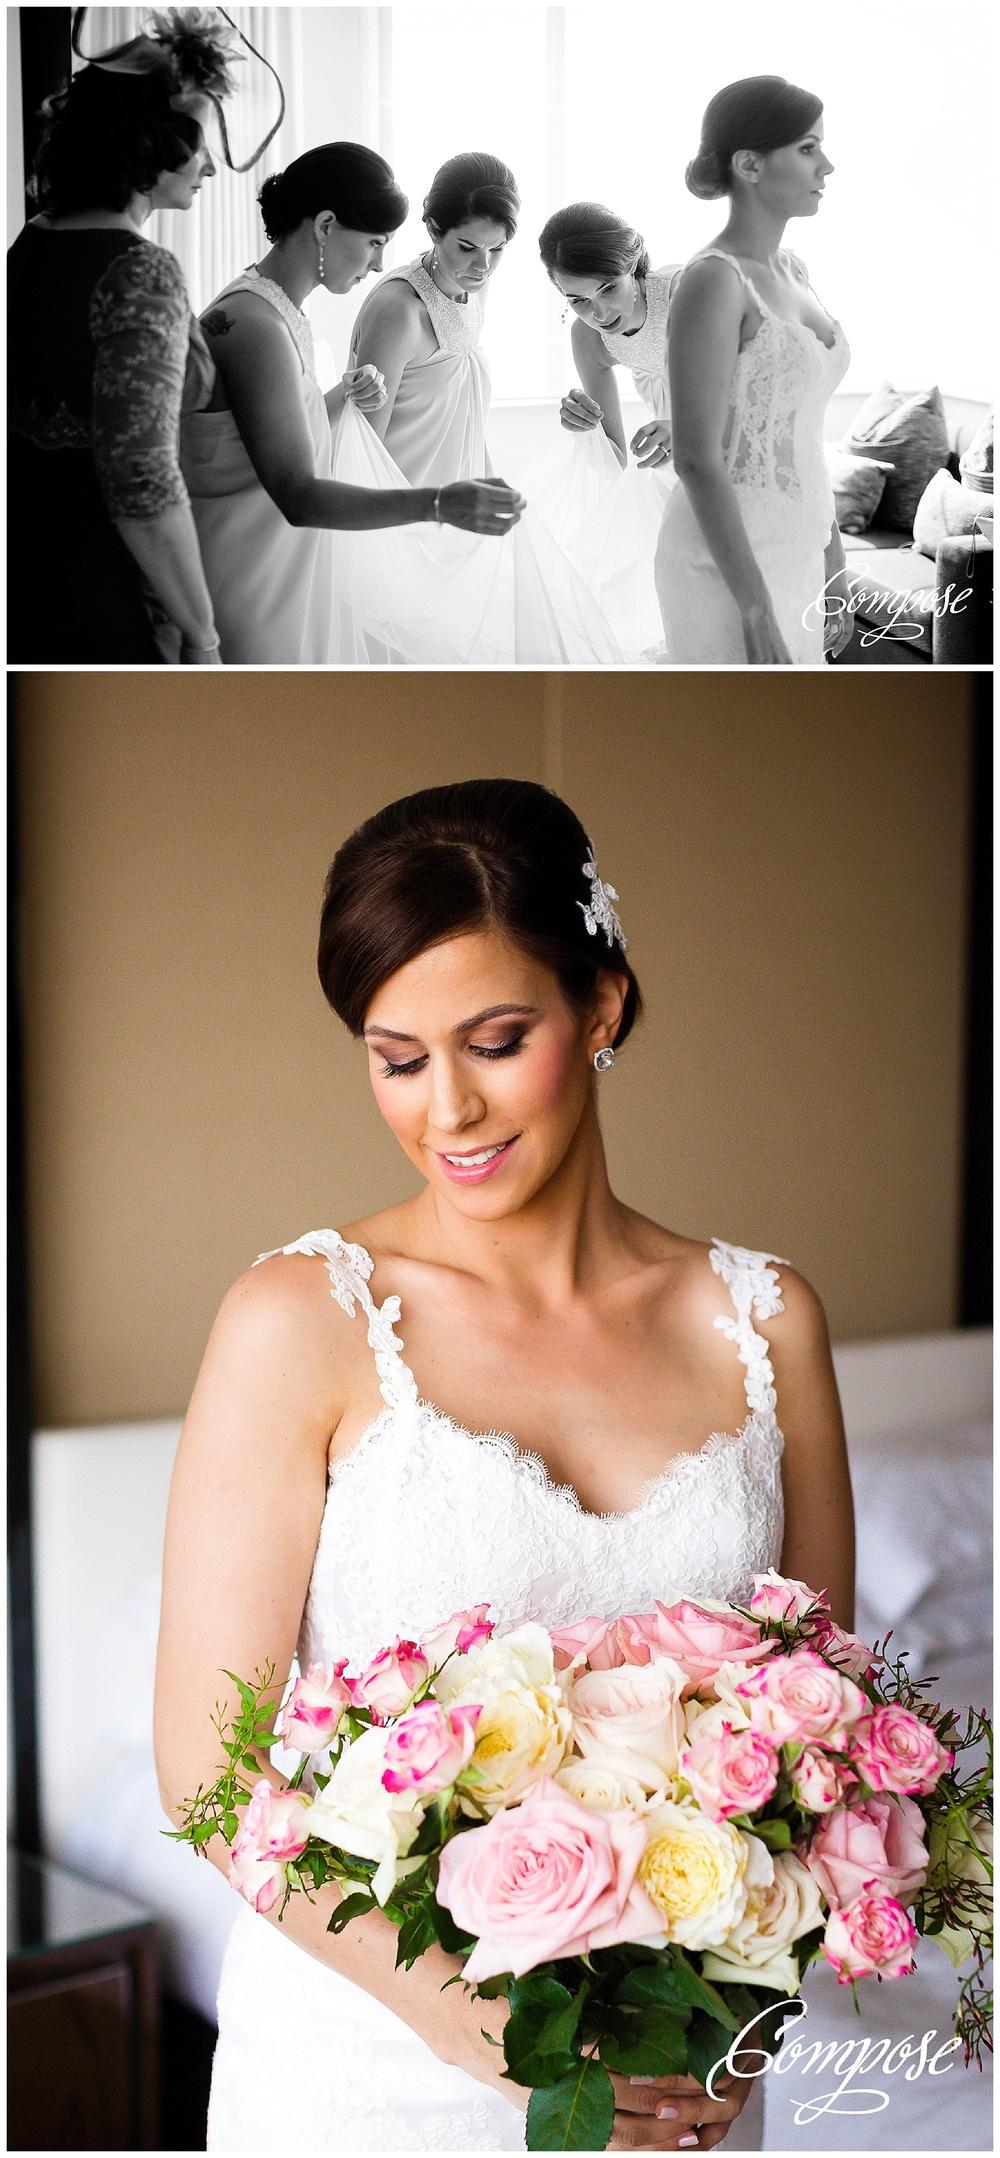 Rebecca Grace wedding flowers